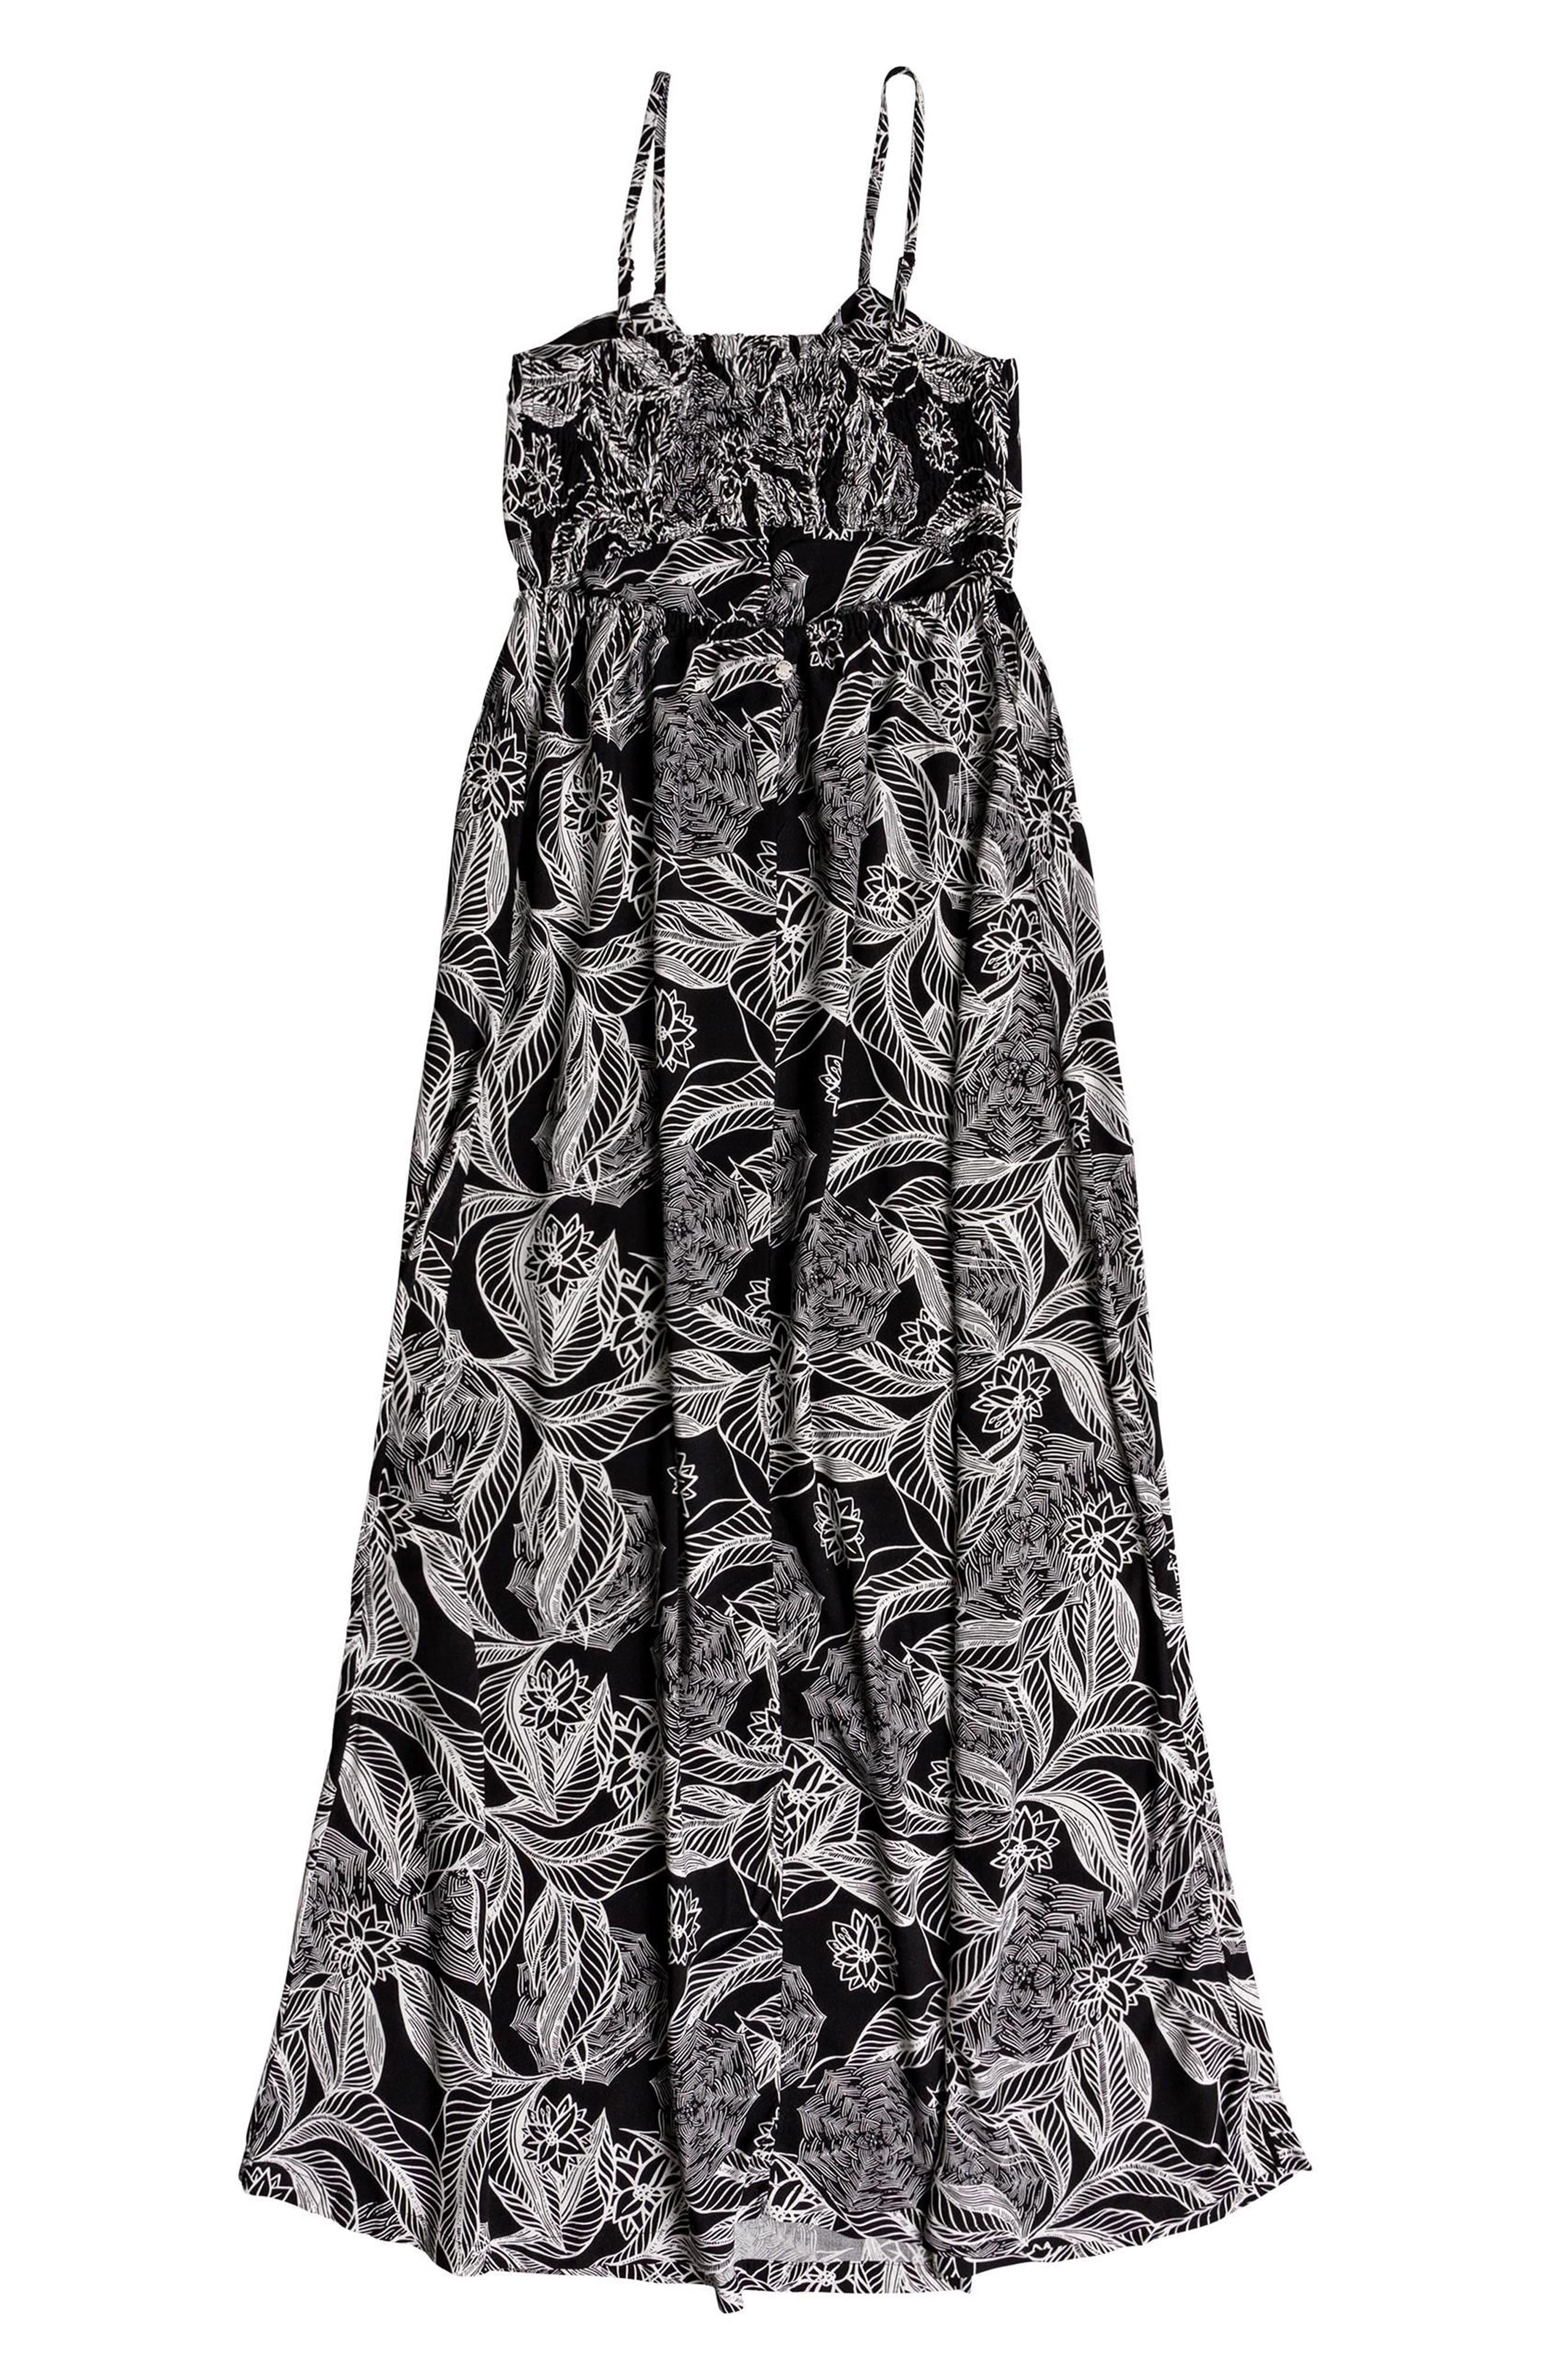 Brilliant Stars Print Maxi Dress,                             Alternate thumbnail 4, color,                             002